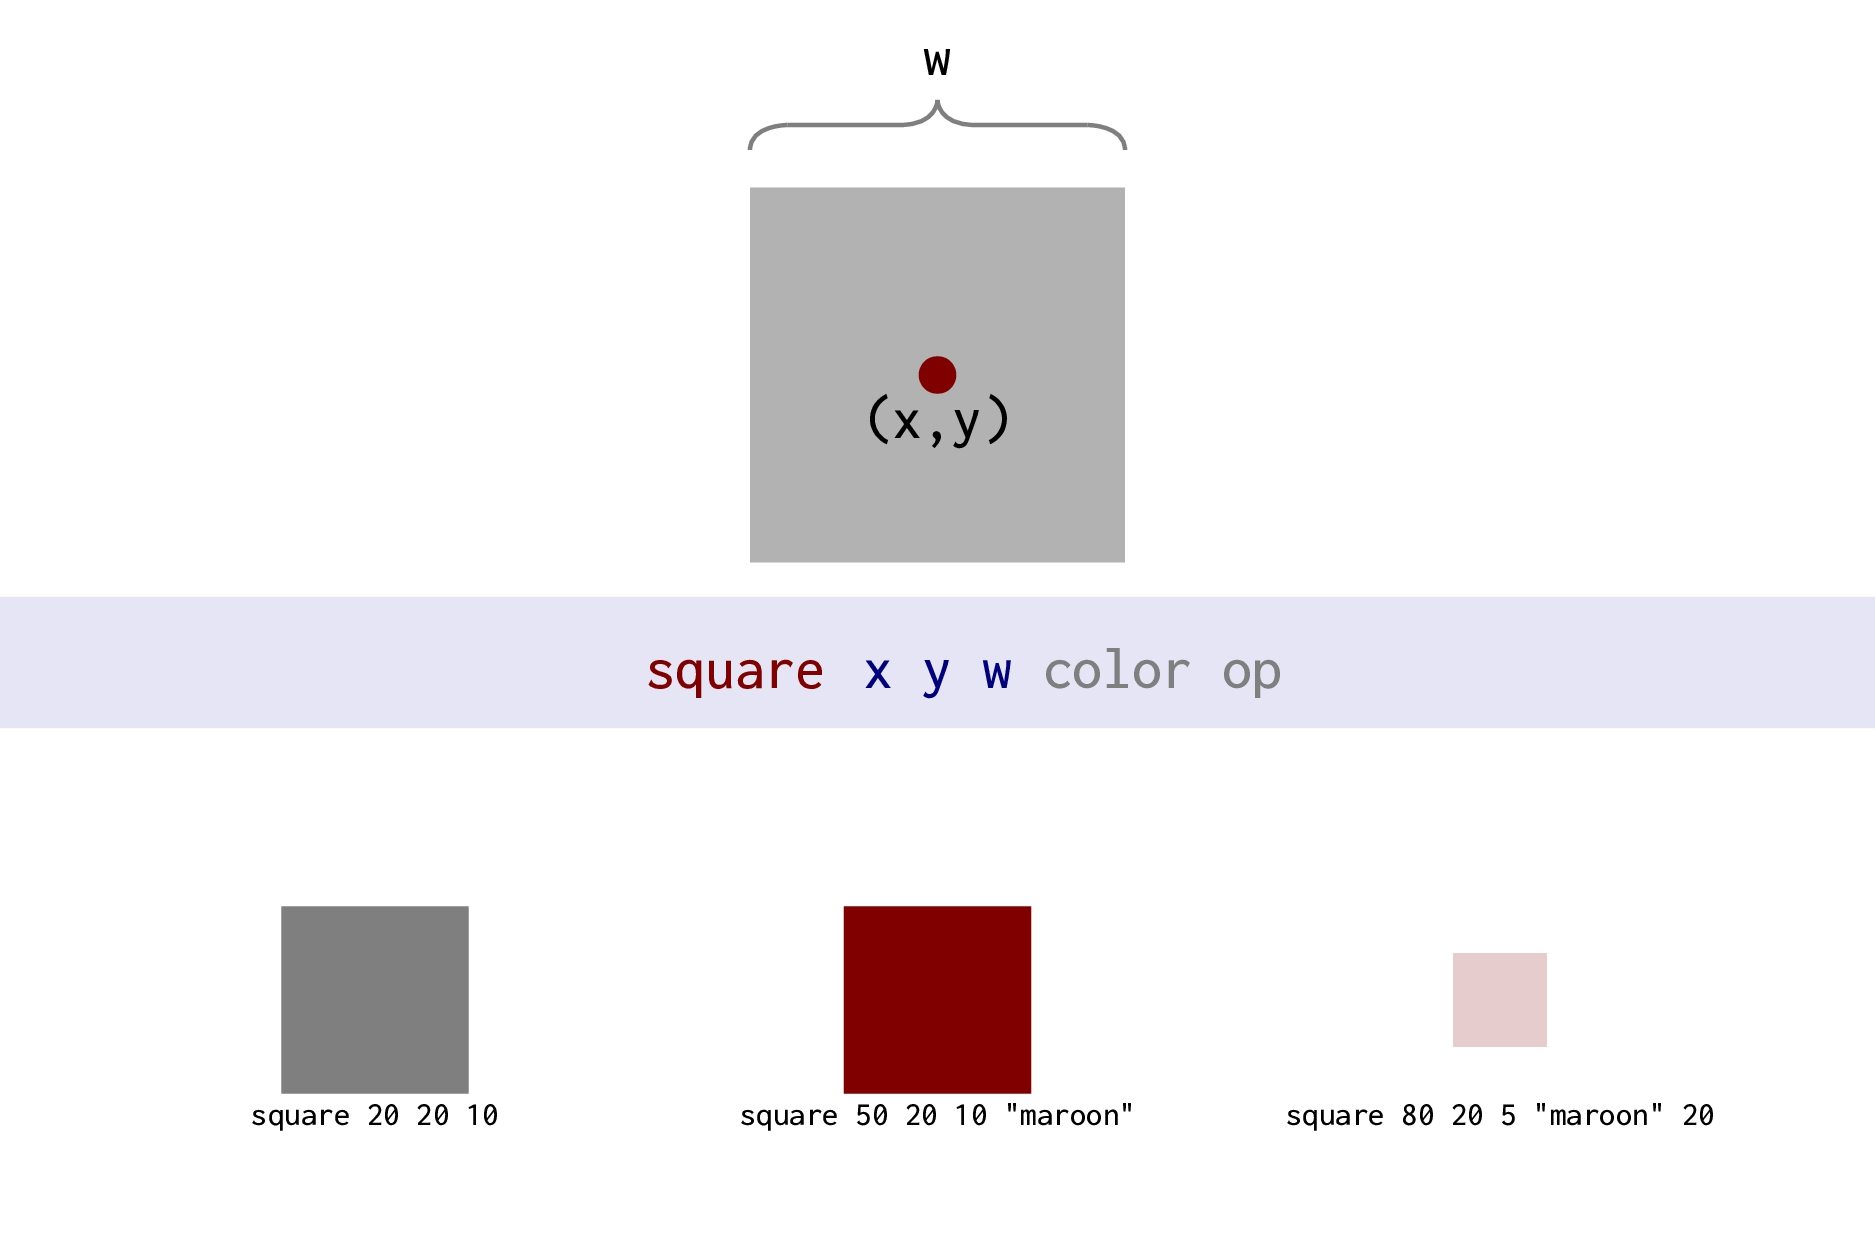 ucarrow bx by cx cy ex ey [lw] [aw] [ah] [color...